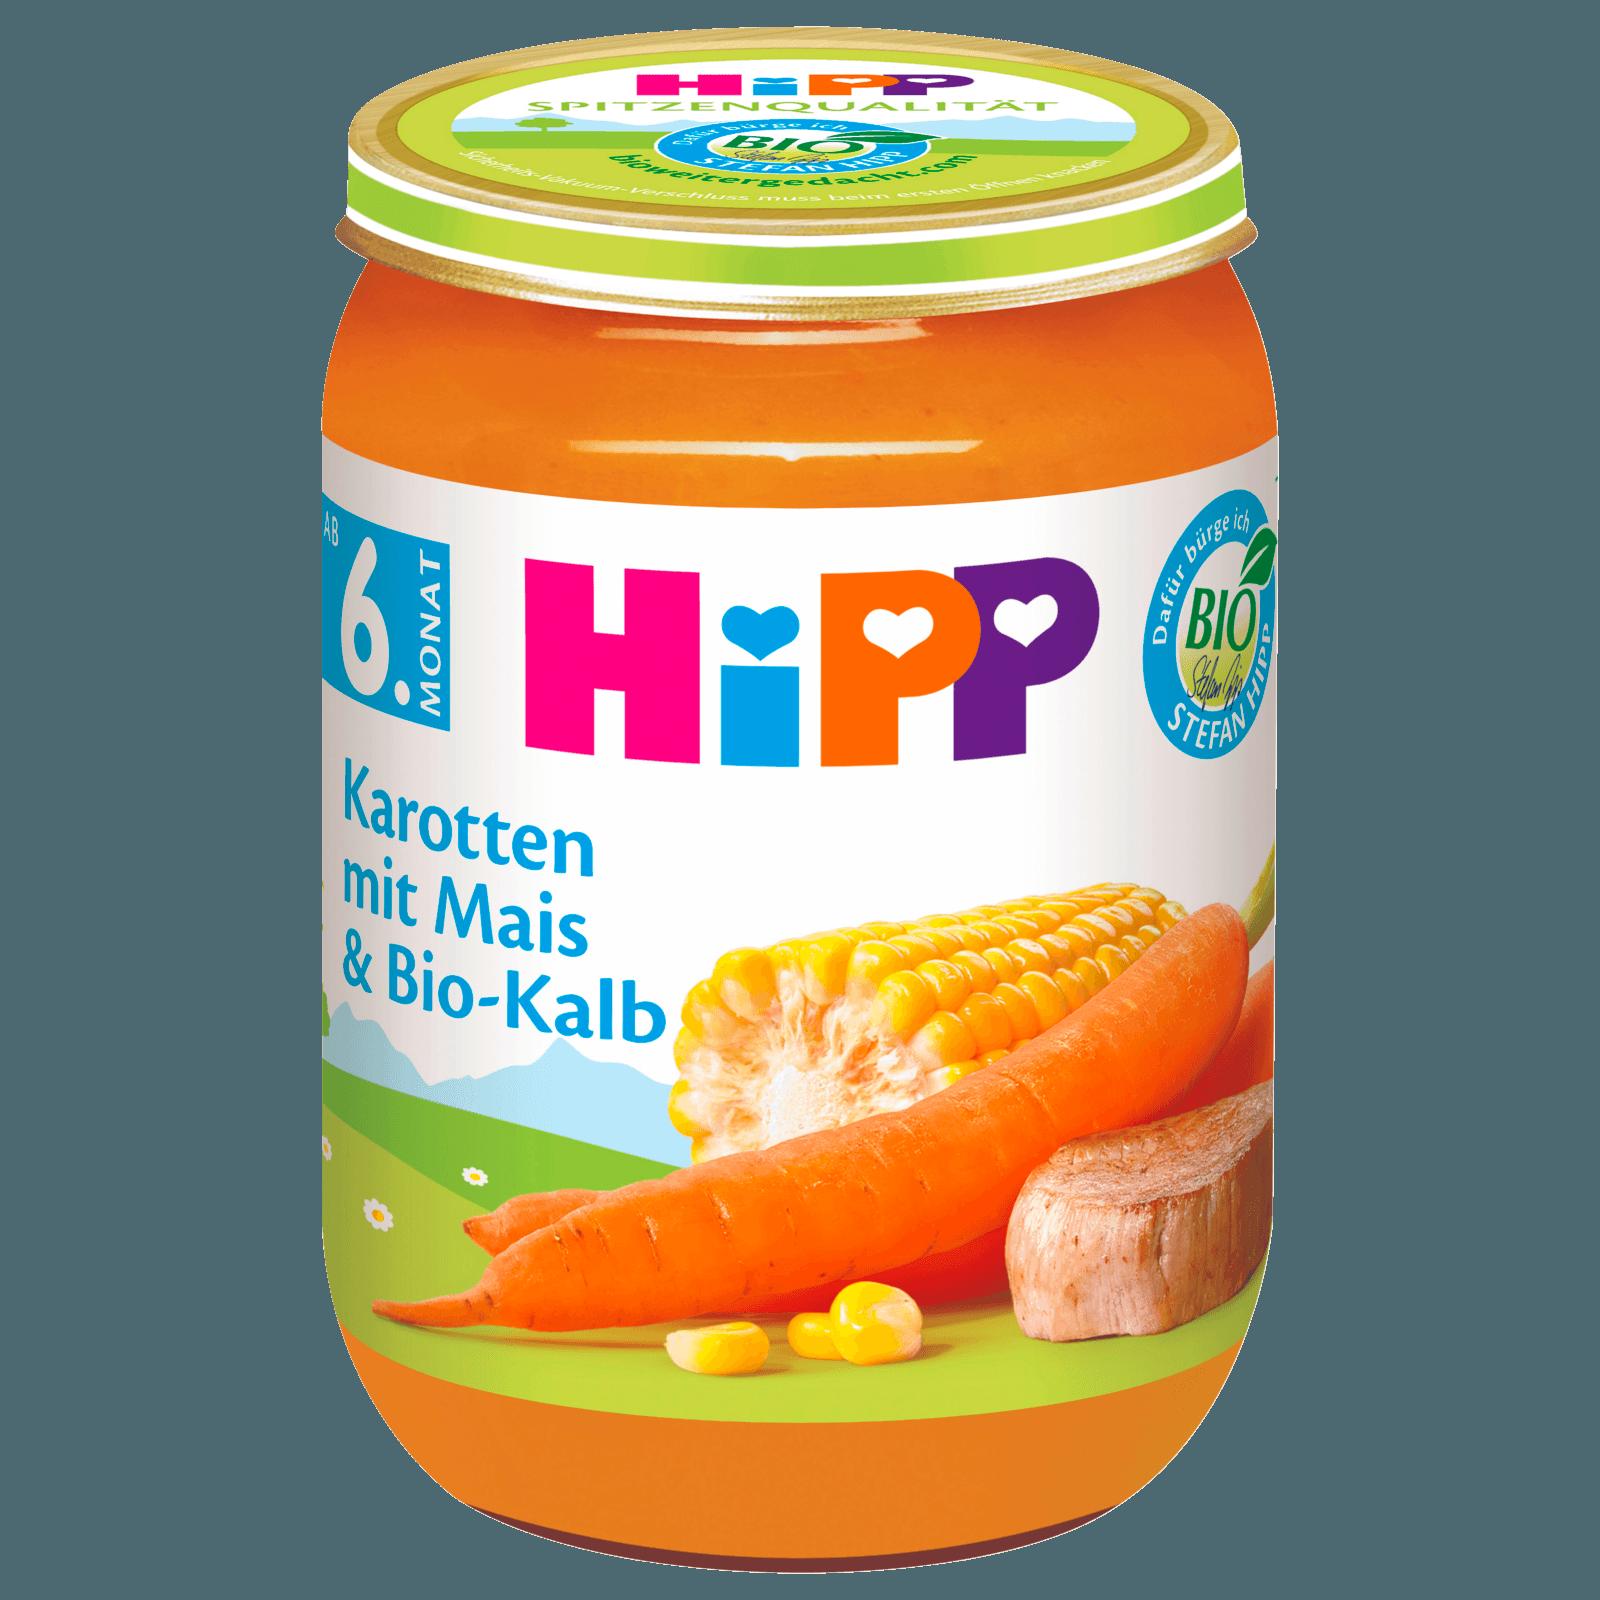 Hipp Karotten mit Mais & Bio-Kalb 190g